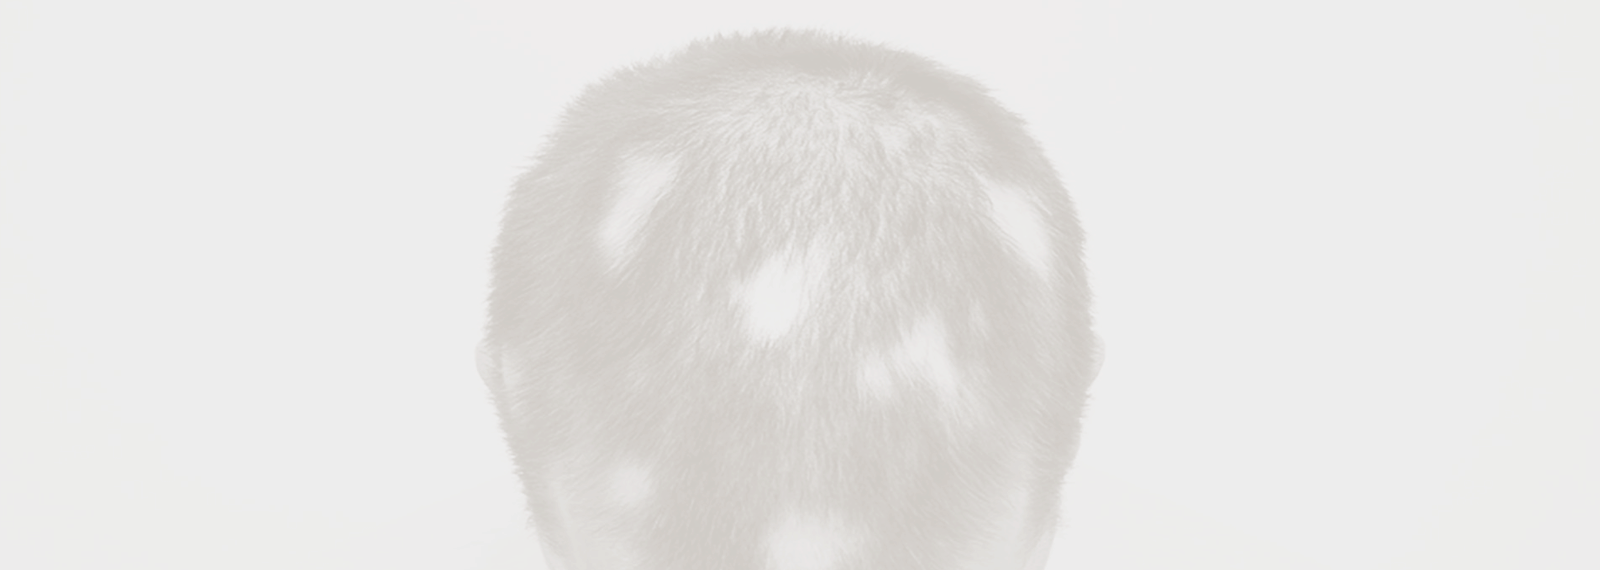 alopecia areata malta